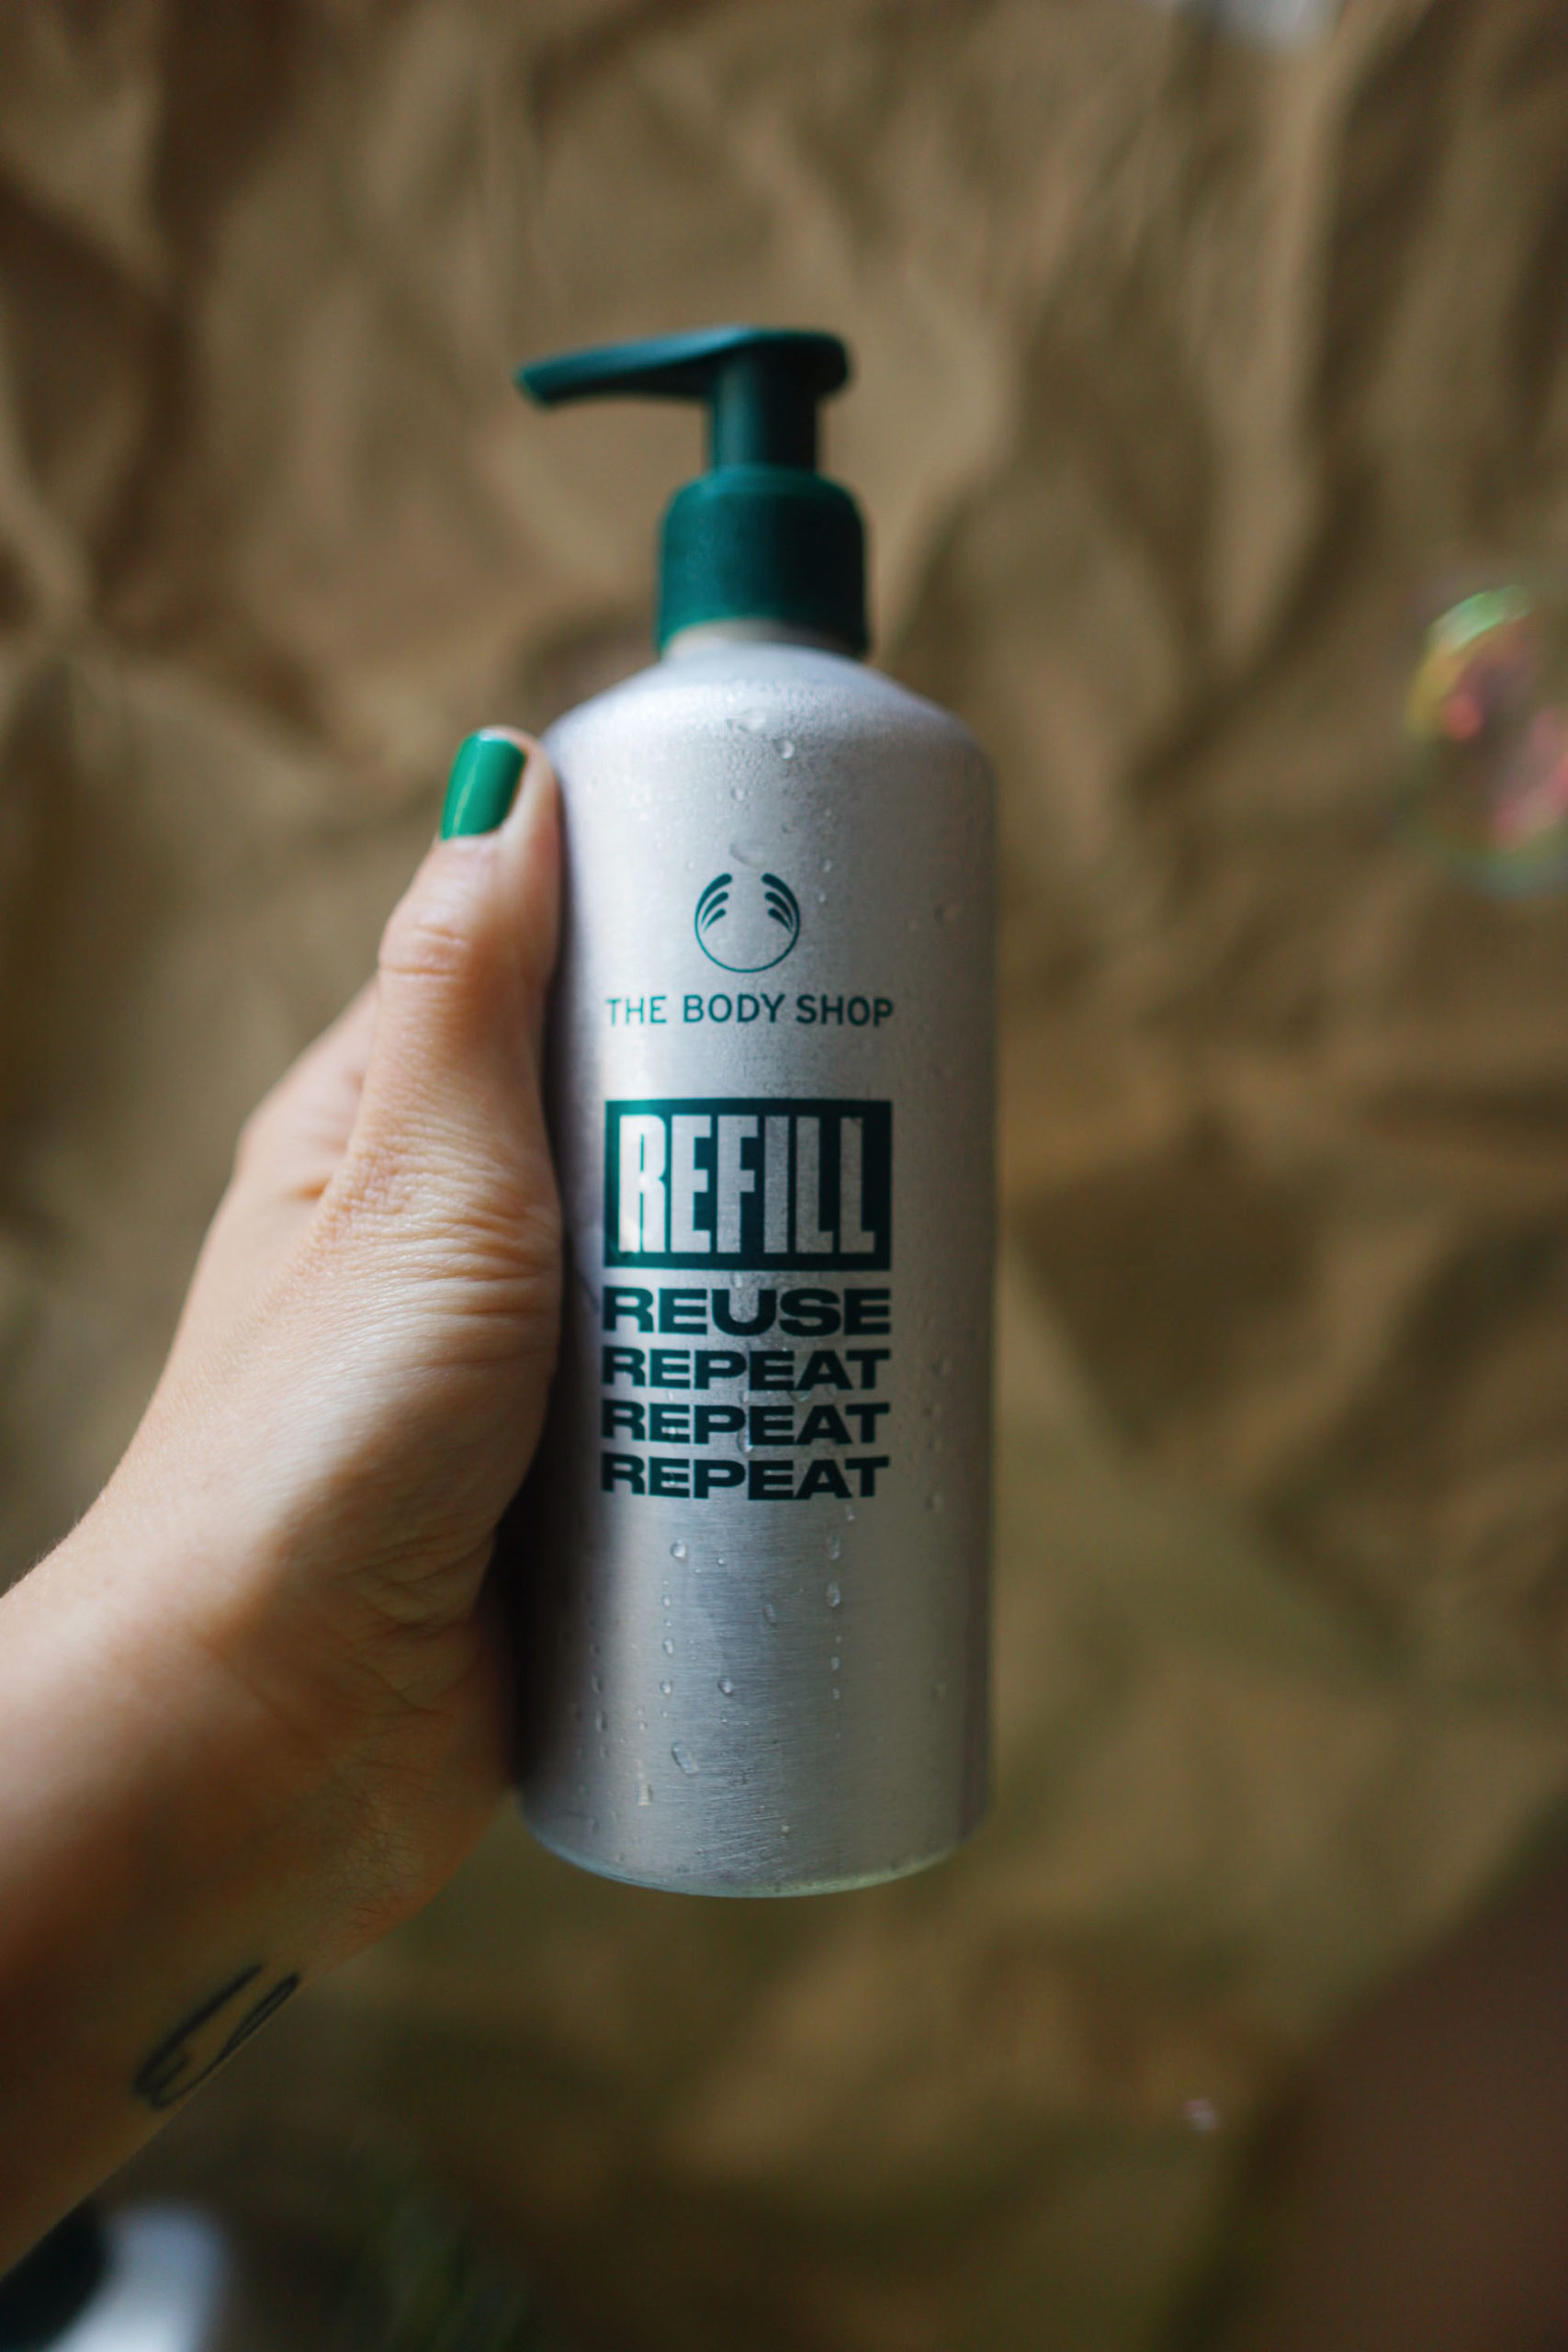 The Body Shop Refill